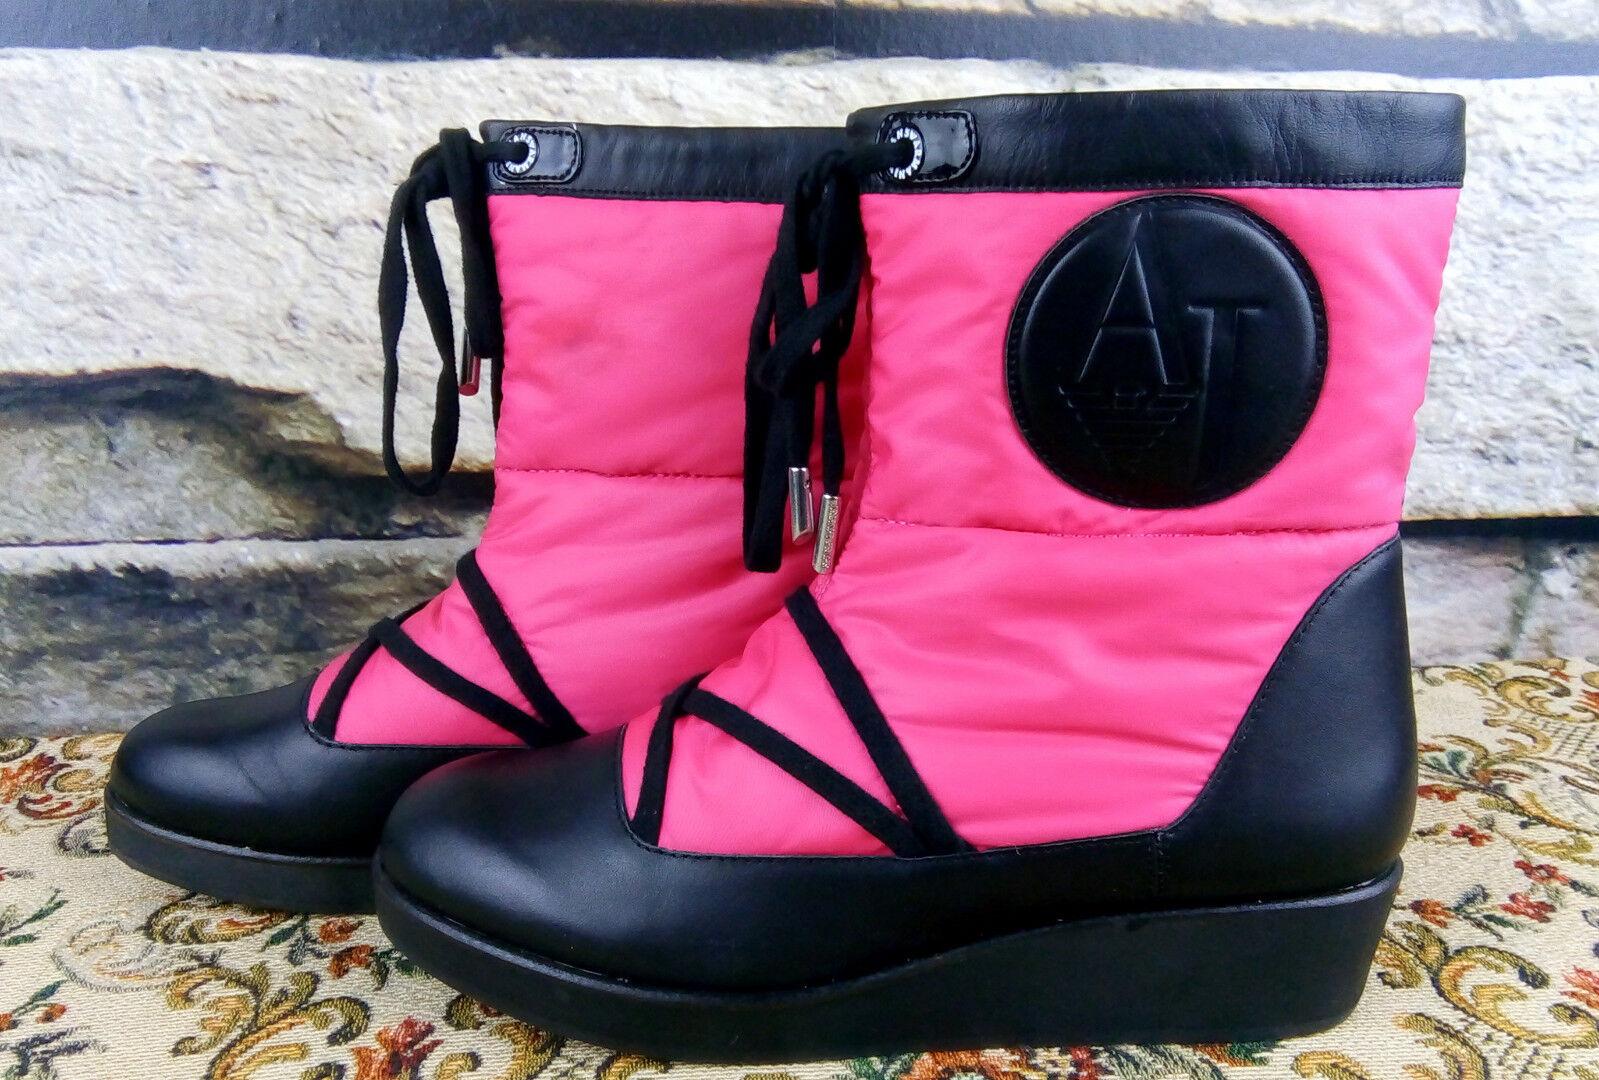 Armani Jeans femmes 39 Tendance Hiver bottes Bottes rose Bottines Chaussures  e9